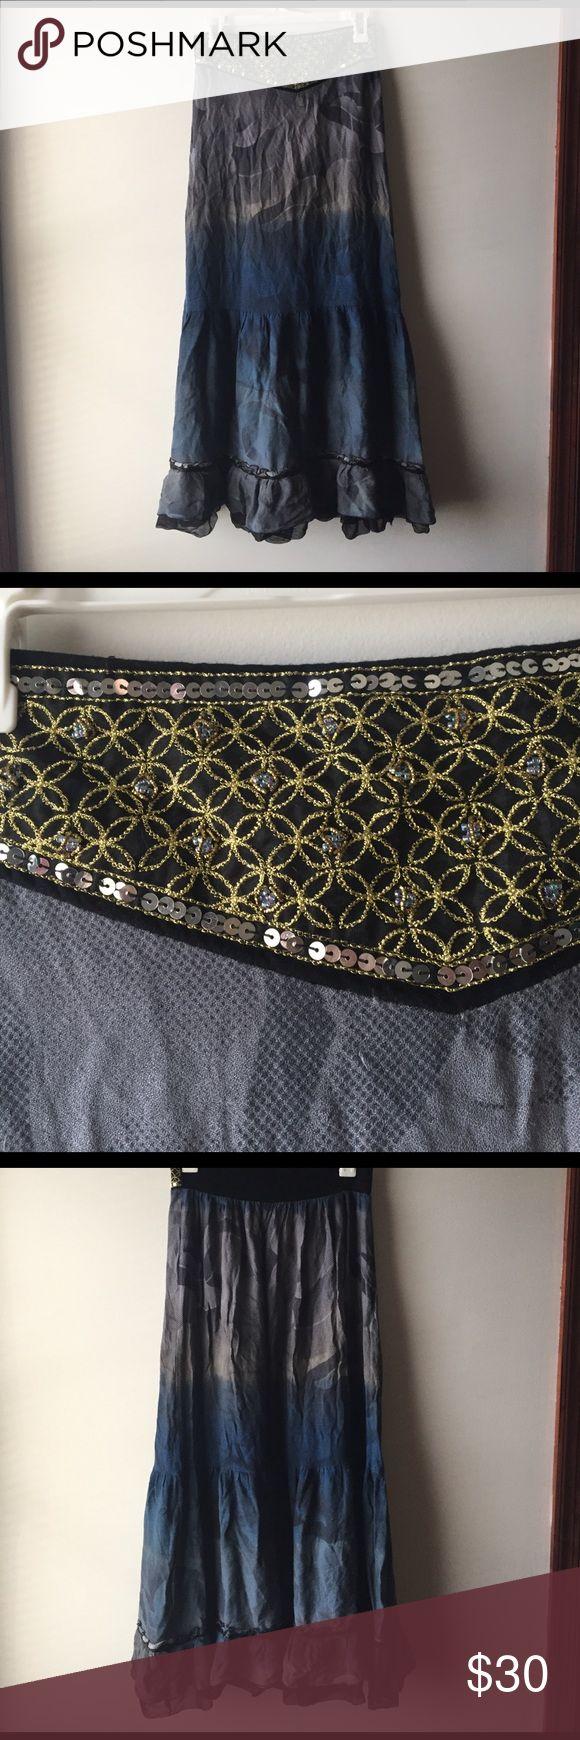 1 day sale! Free People boho maxi skirt ✌🏽️ EUC Free People boho elastic waist tiered maxi skirt with sequin embellishment, really fun for festival season! ✌🏽️ Free People Skirts Maxi